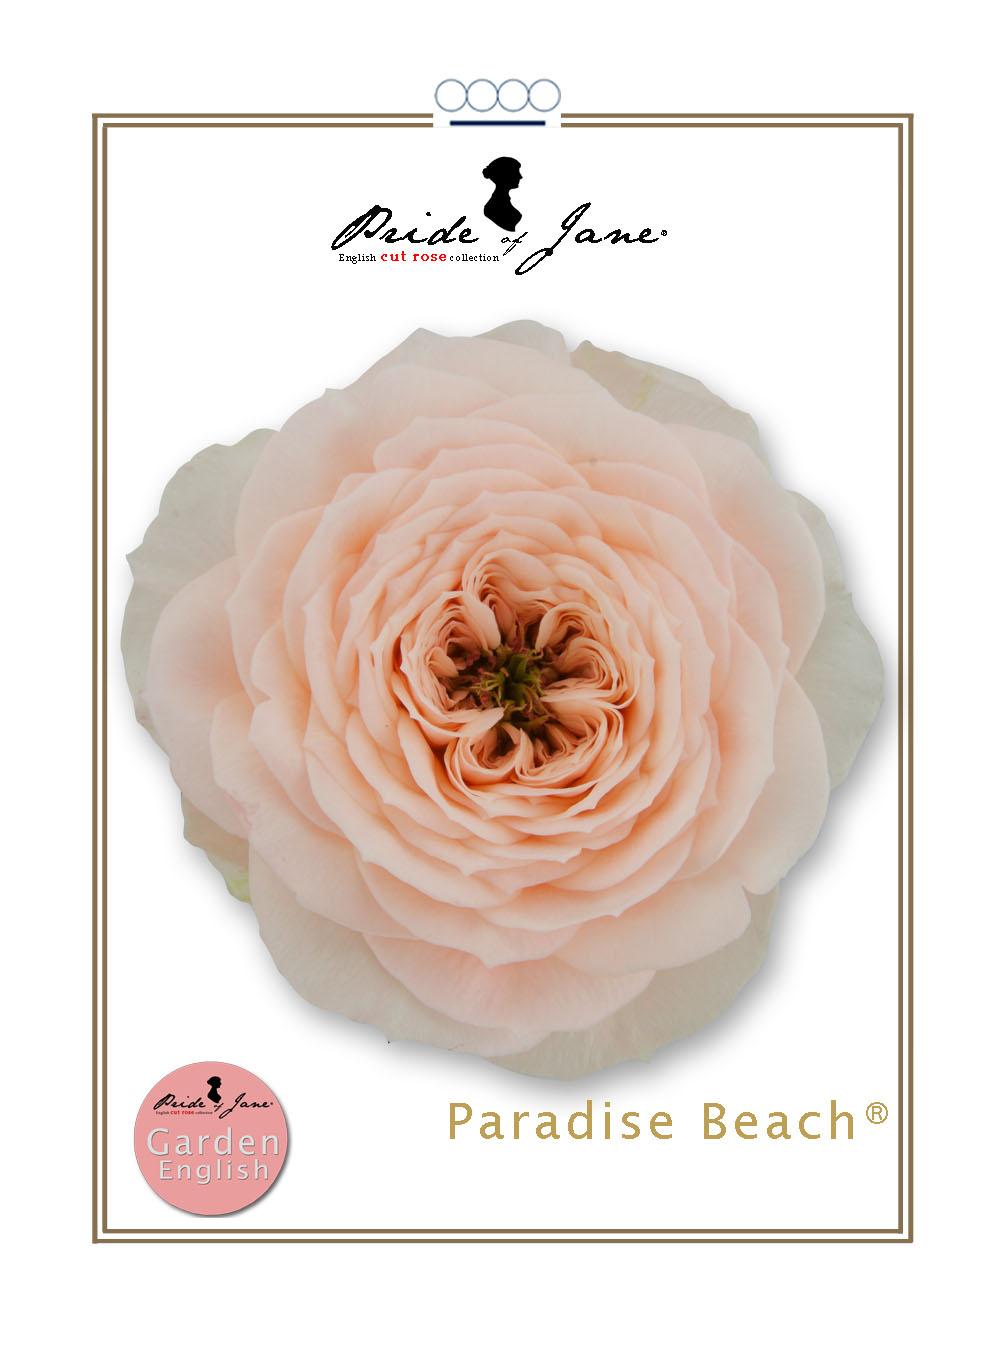 Paradise Beach®